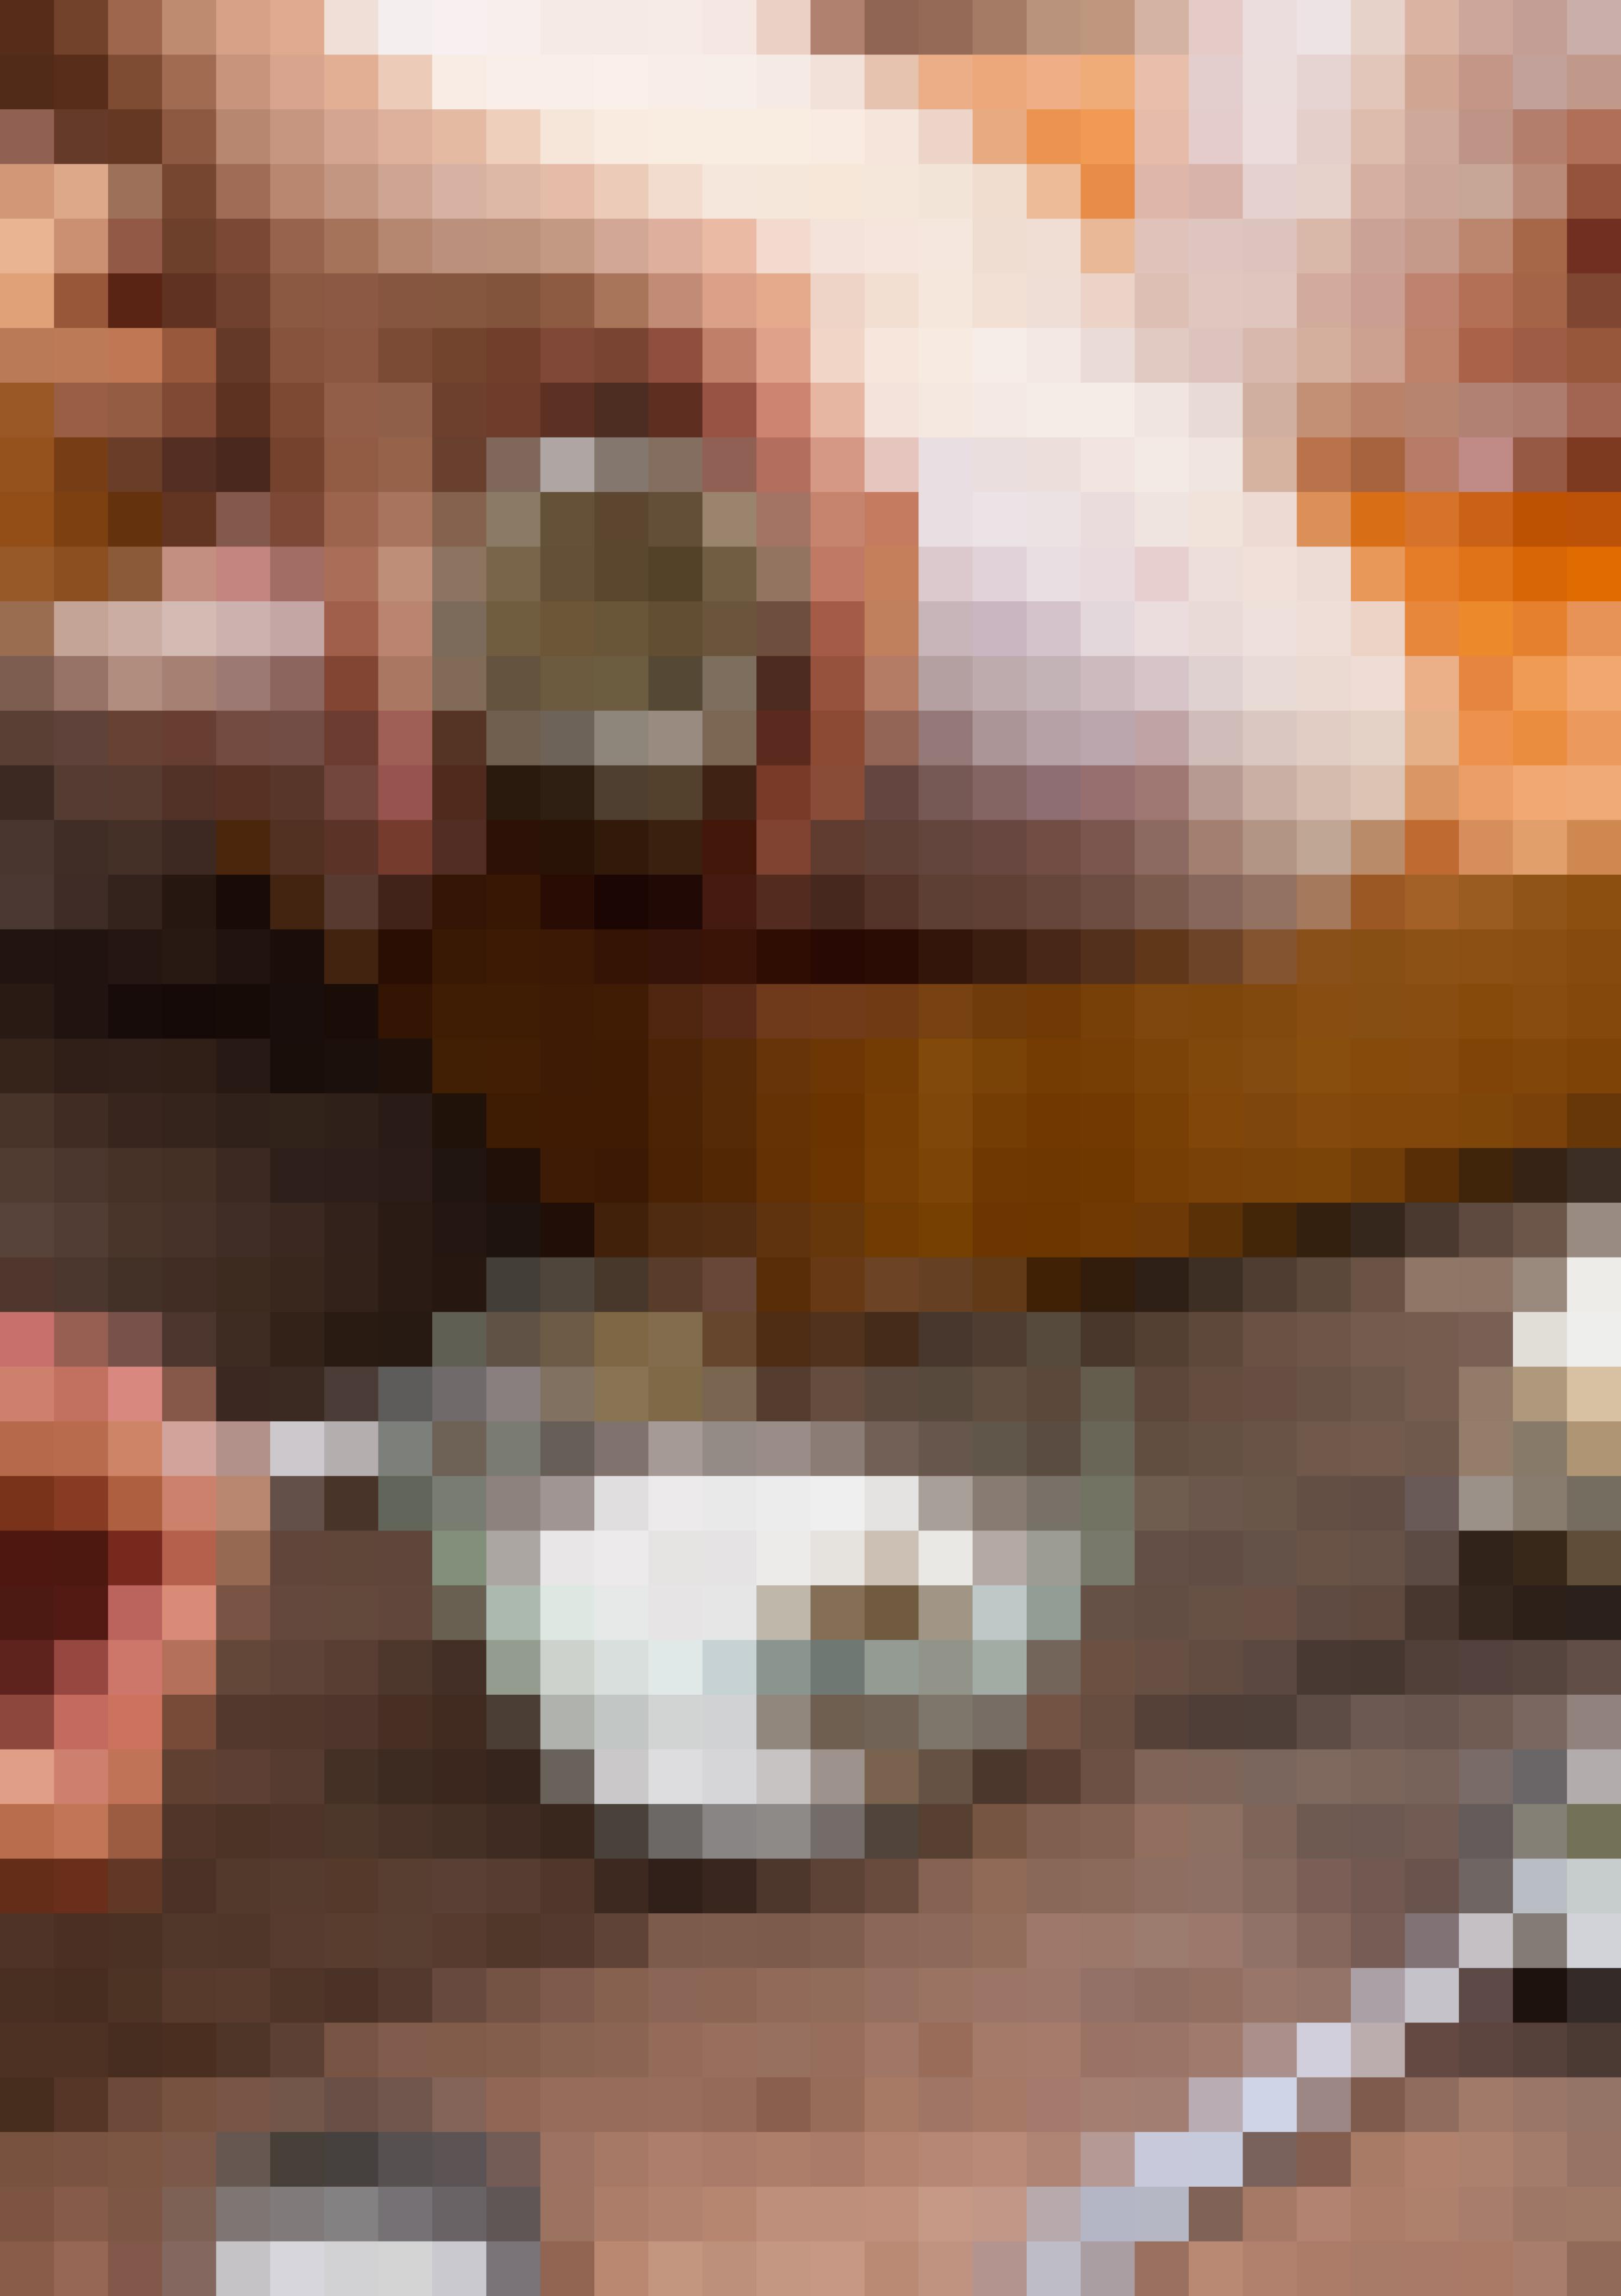 Pumpkin Pie in a Mug, Pull-Apart Cheese Bread, Red Lentil Soup, Lamb Rogan Josh & Pretzel Cinnamon Rolls: gallery image 2